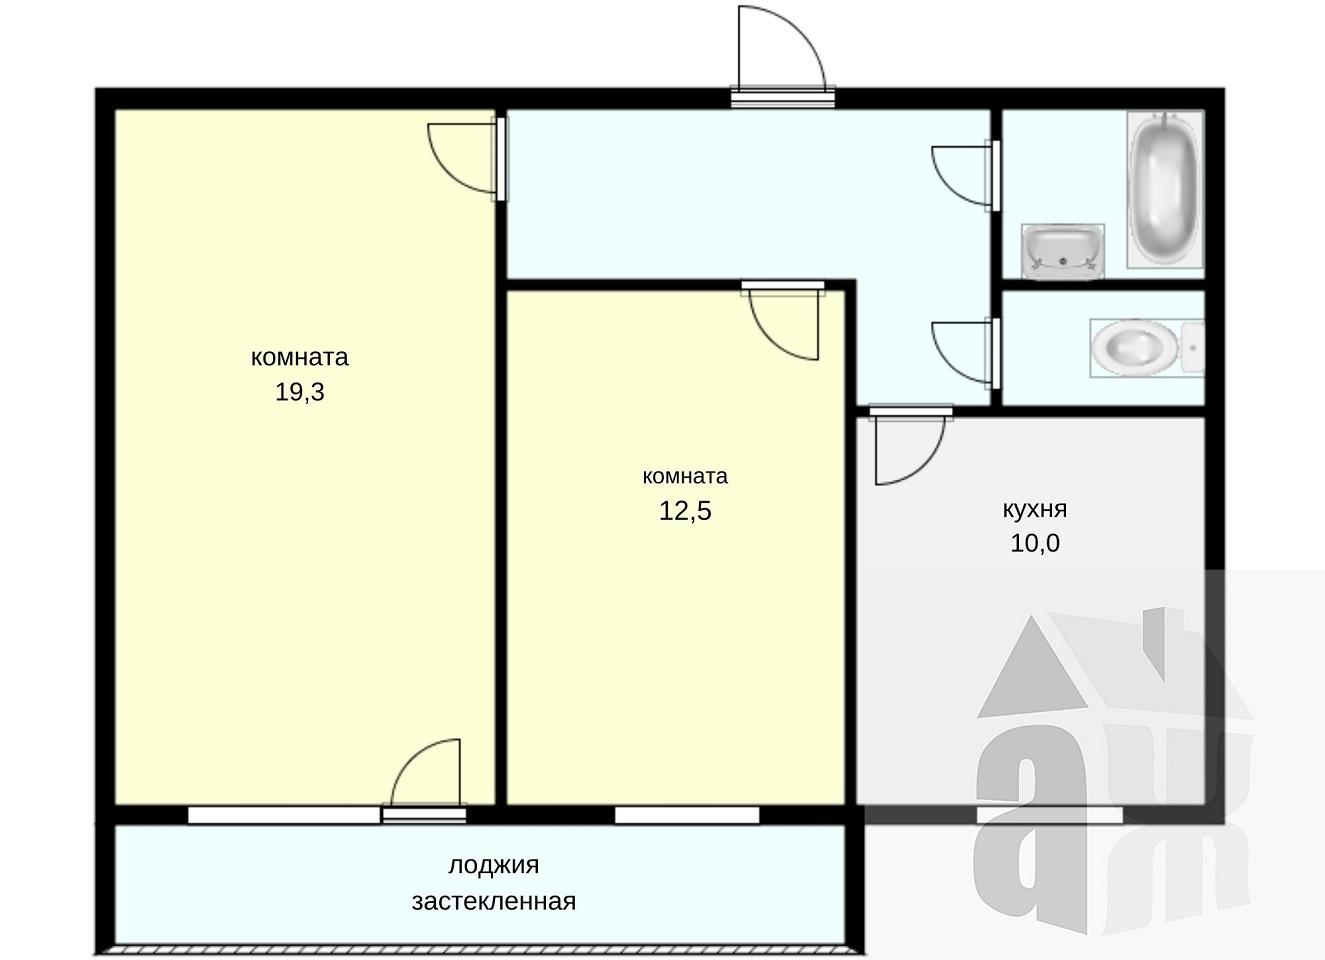 2-комнатная квартира, Томск, Айвазовского, 31